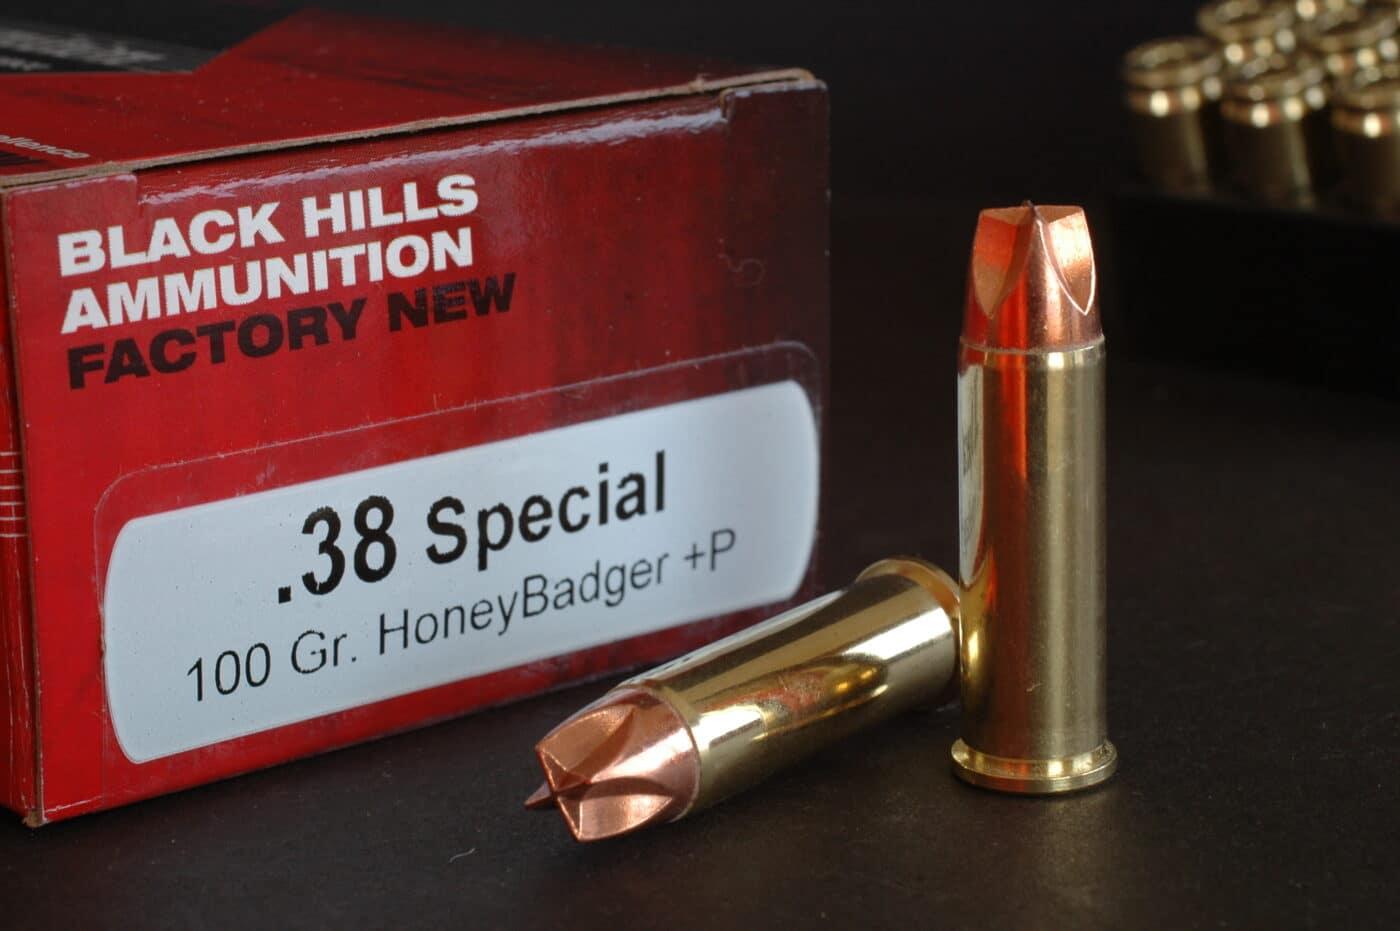 Honey Badge ammo for military use